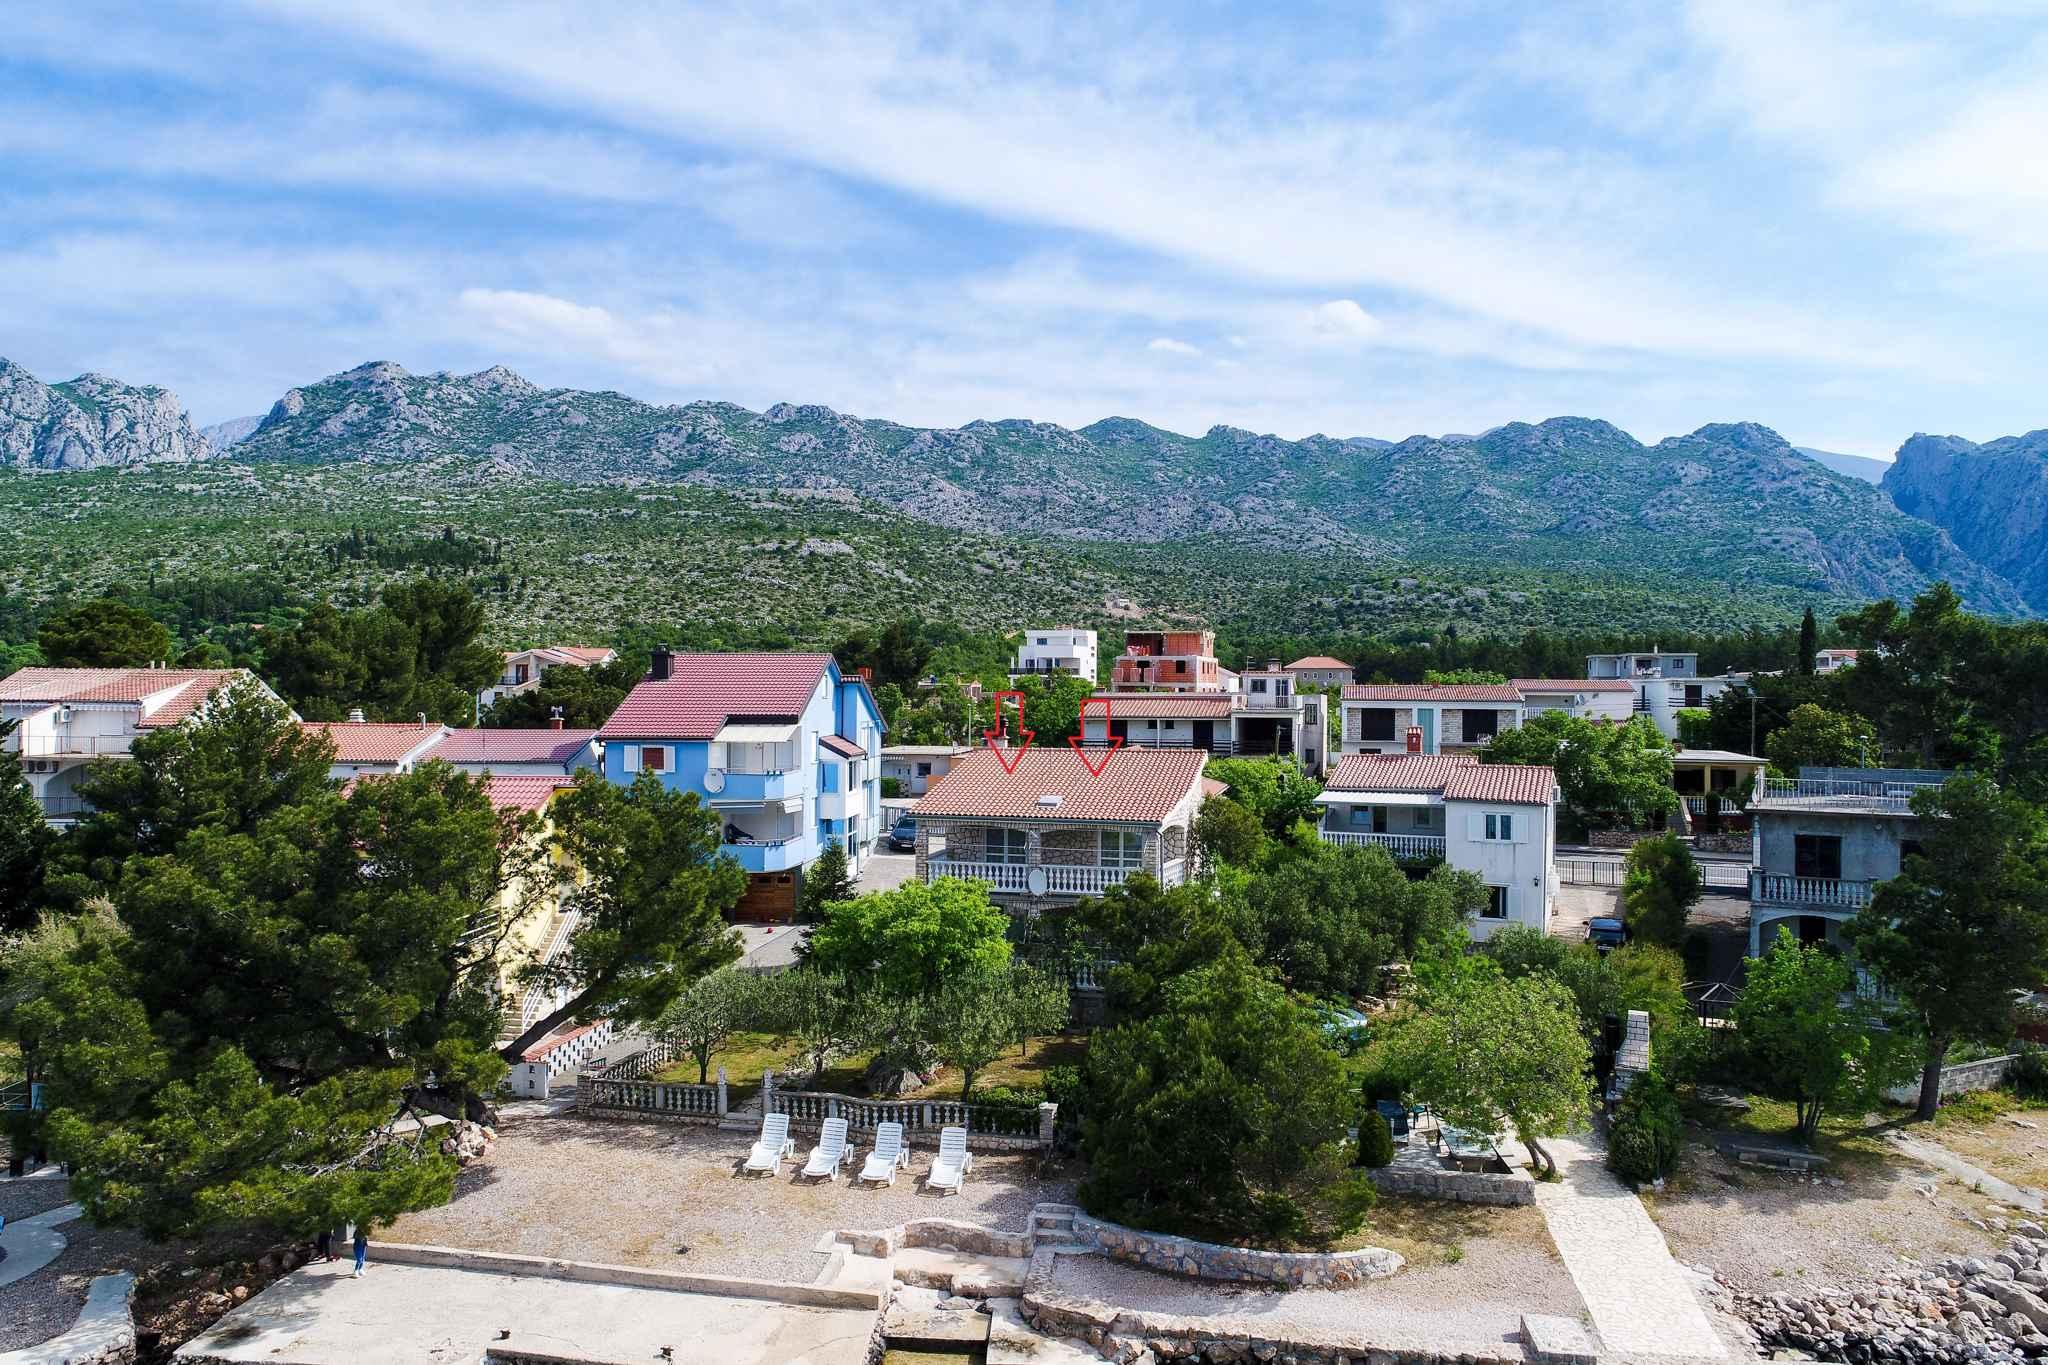 Ferienwohnung mit Panoramameerblick (287921), Starigrad Paklenica, , Dalmatien, Kroatien, Bild 5